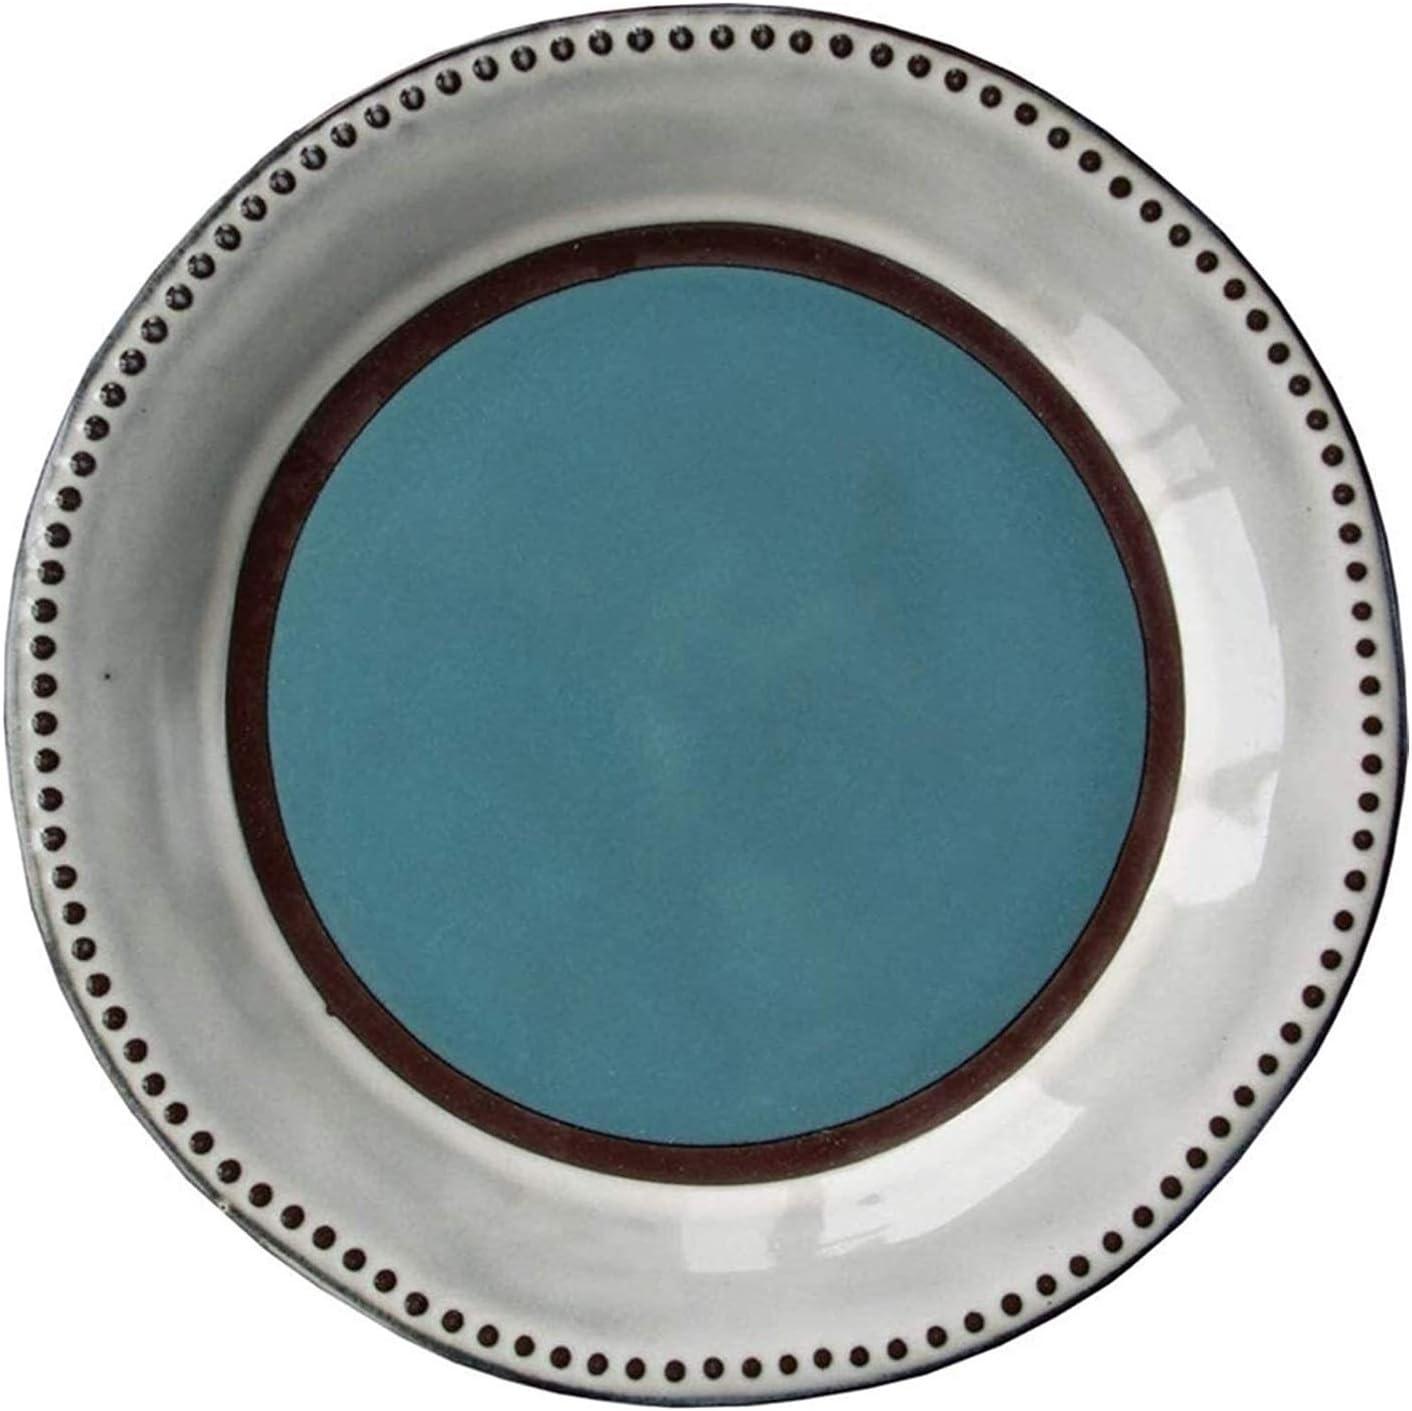 Water Drop Petals Plate Porcelain Dinner Blue Dedication Pl Large discharge sale Home Restaurant